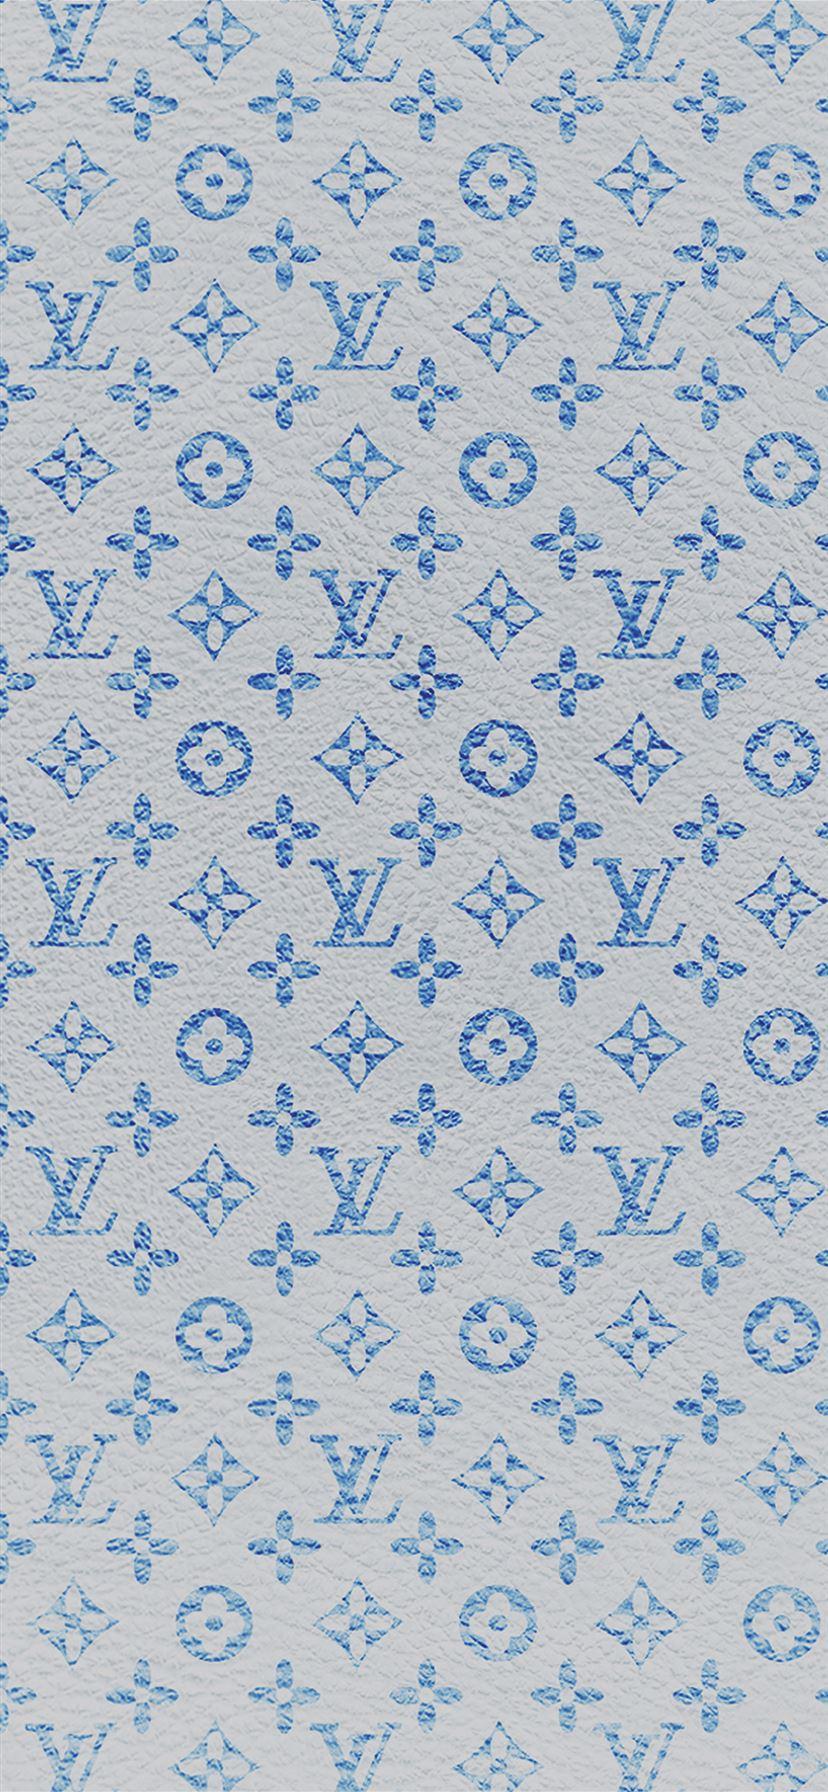 Louis Vuitton Blue Pattern Art Iphone 11 Wallpapers Free